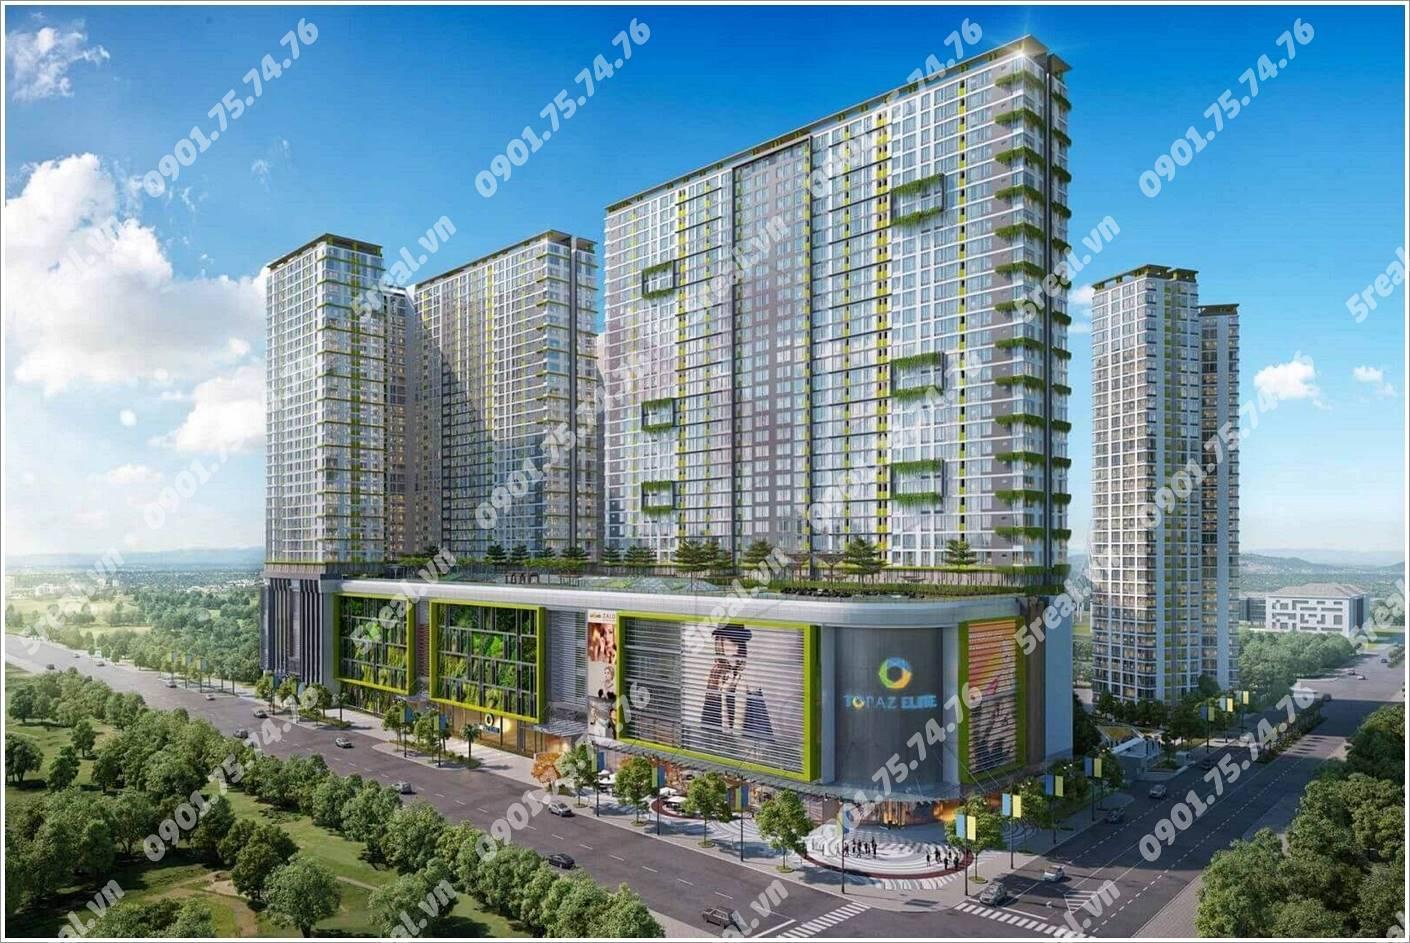 topaz-city-cao-lo-quan-8-van-phong-cho-thue-tphcm-5real.vn-03